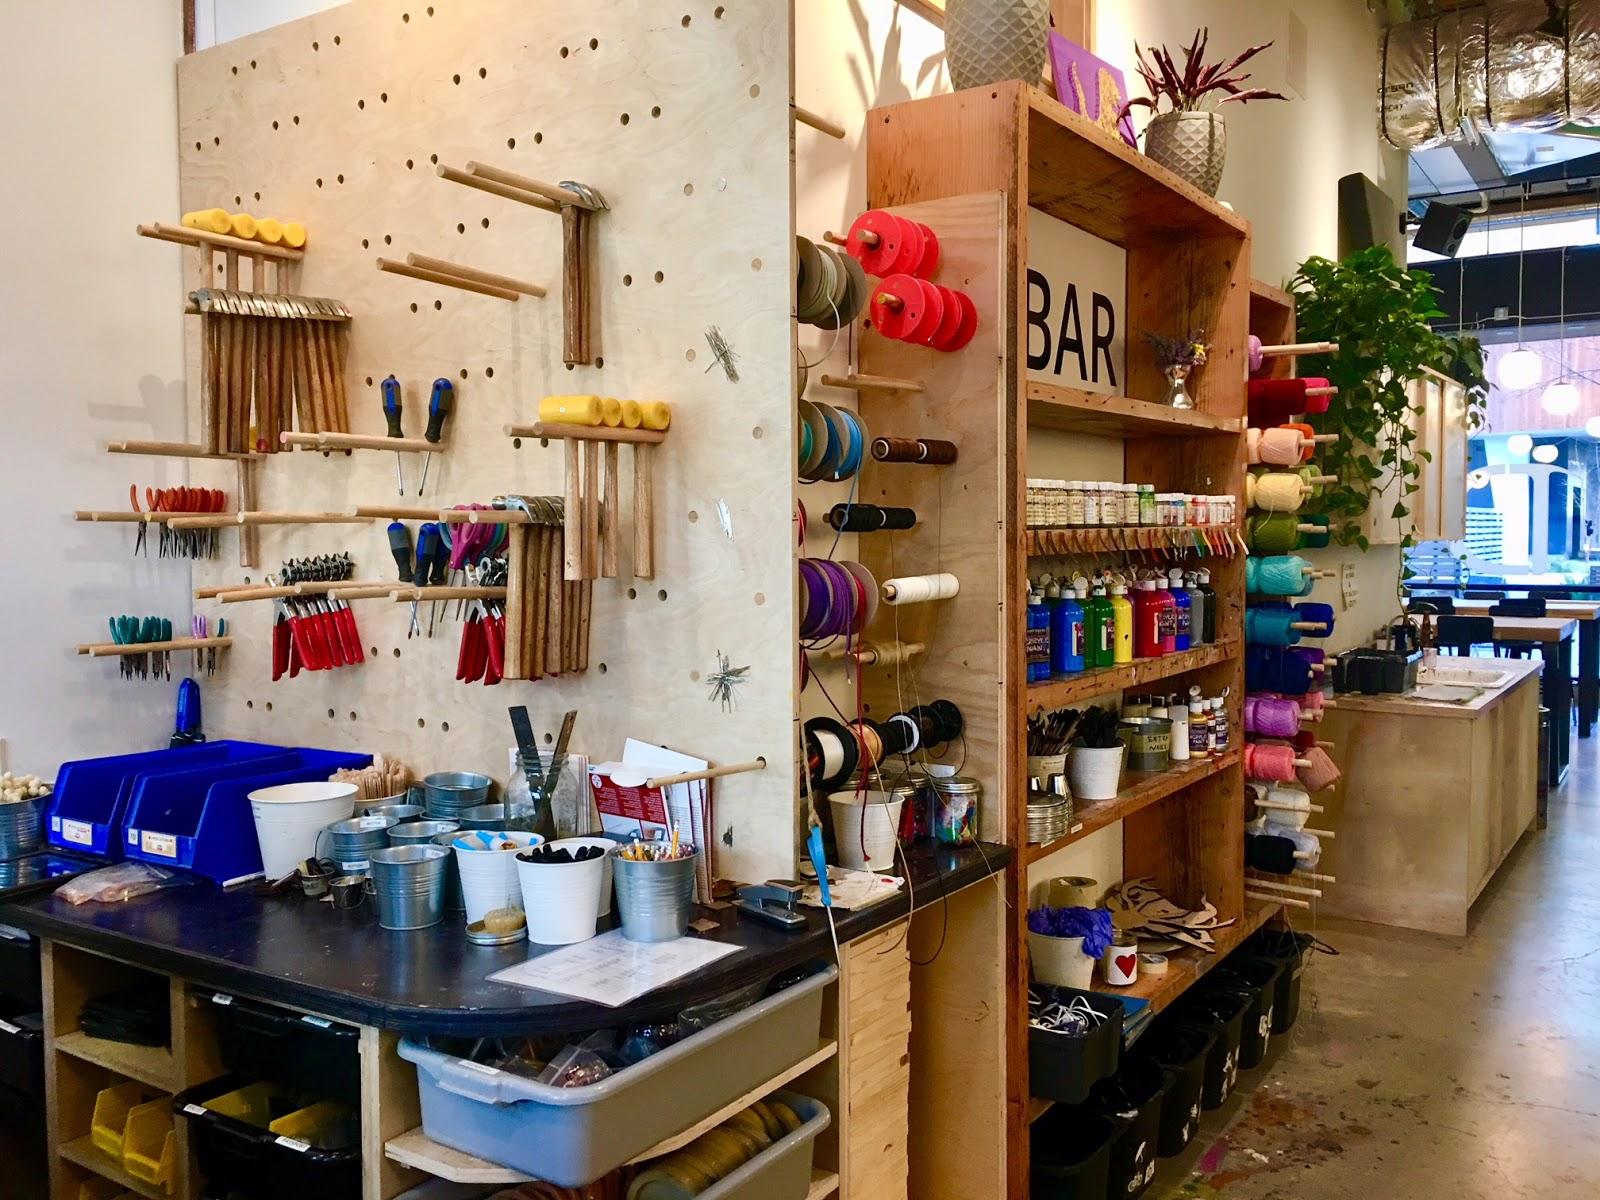 DIY Bar Portland Oregon Review